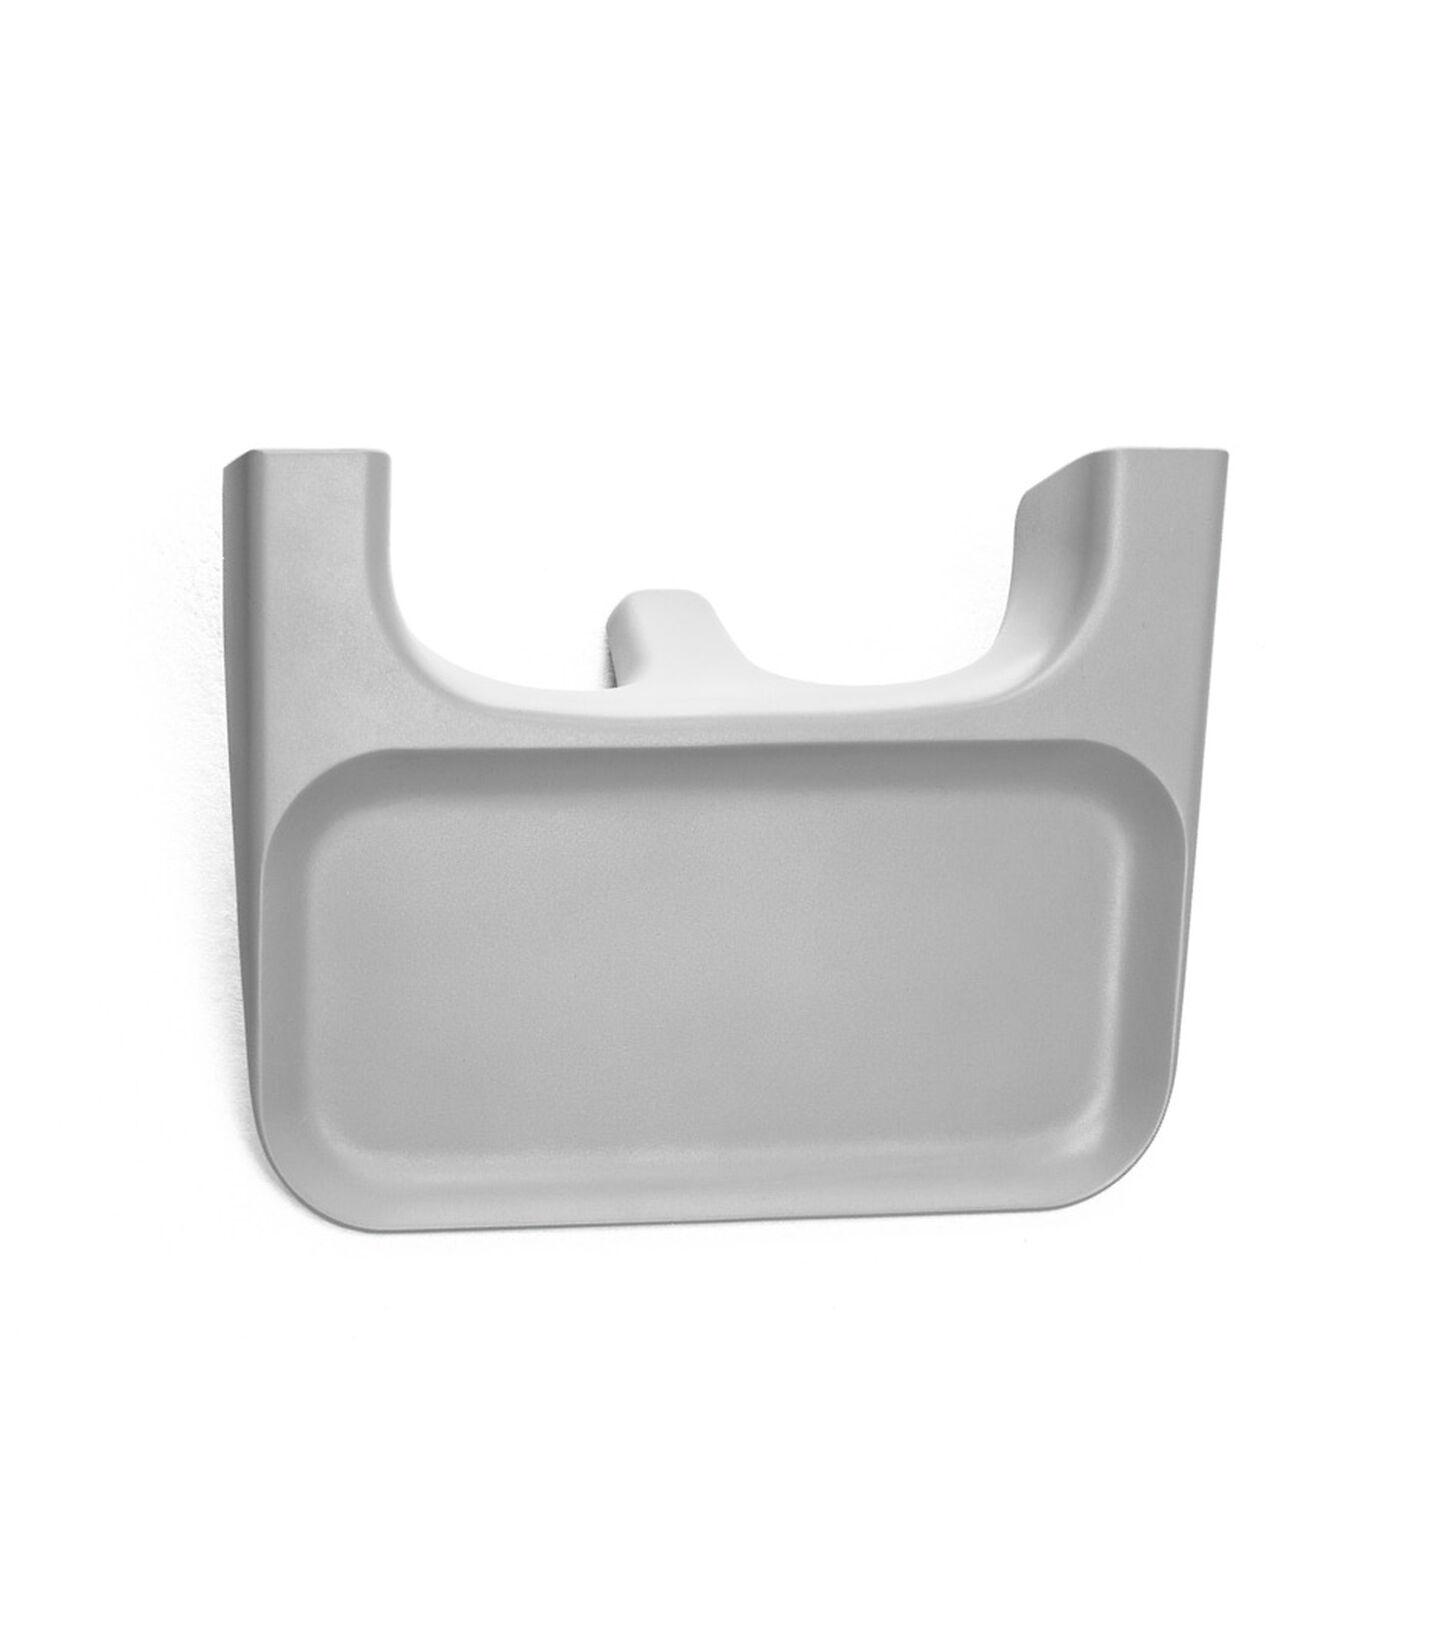 Stokke® Clikk™ Tray - Cloud Grey, Cloud Grey, mainview view 2